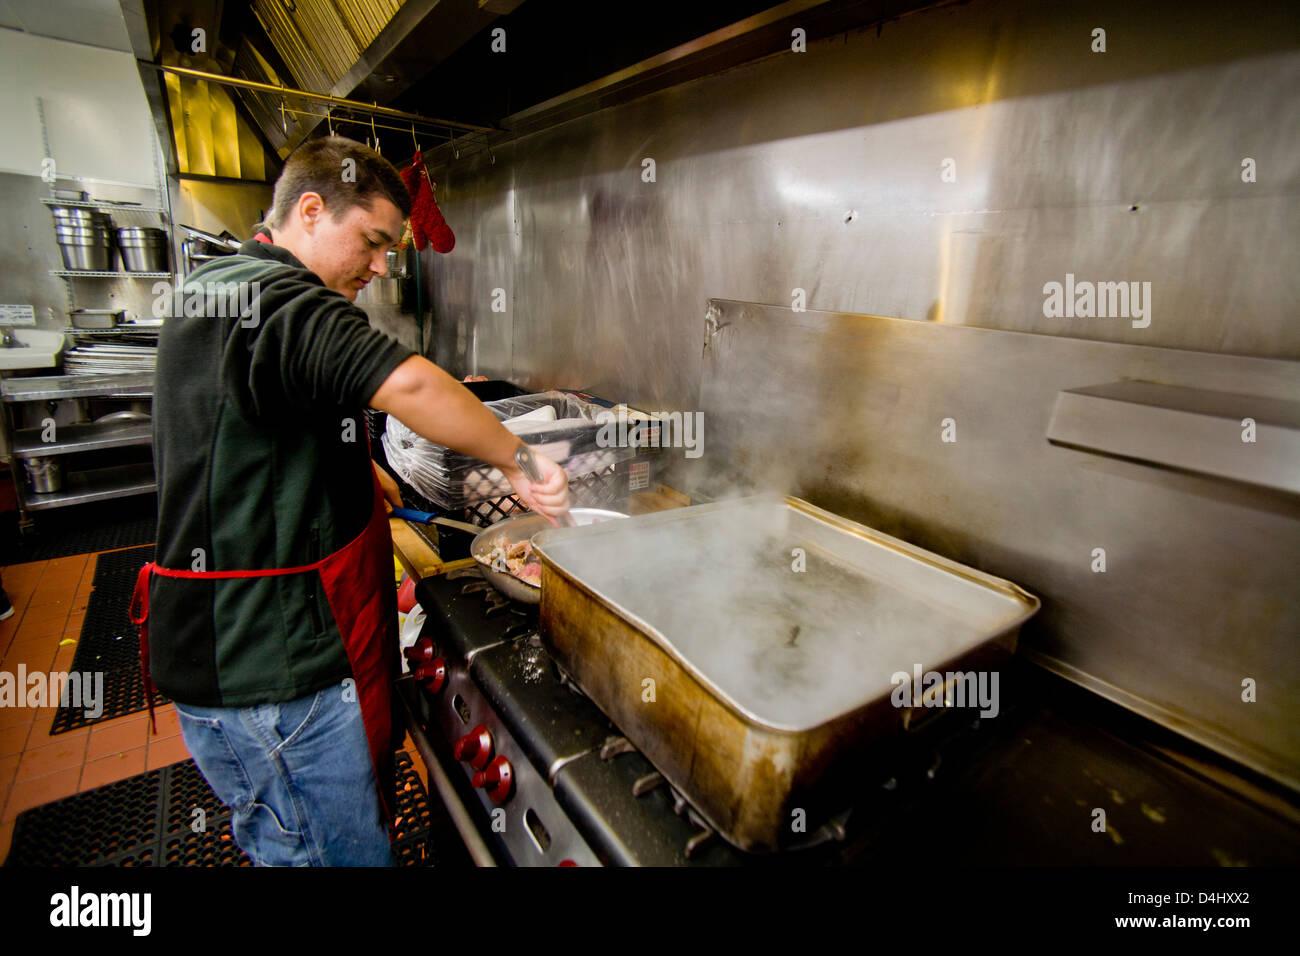 Costa Mesa Stockfotos & Costa Mesa Bilder - Alamy